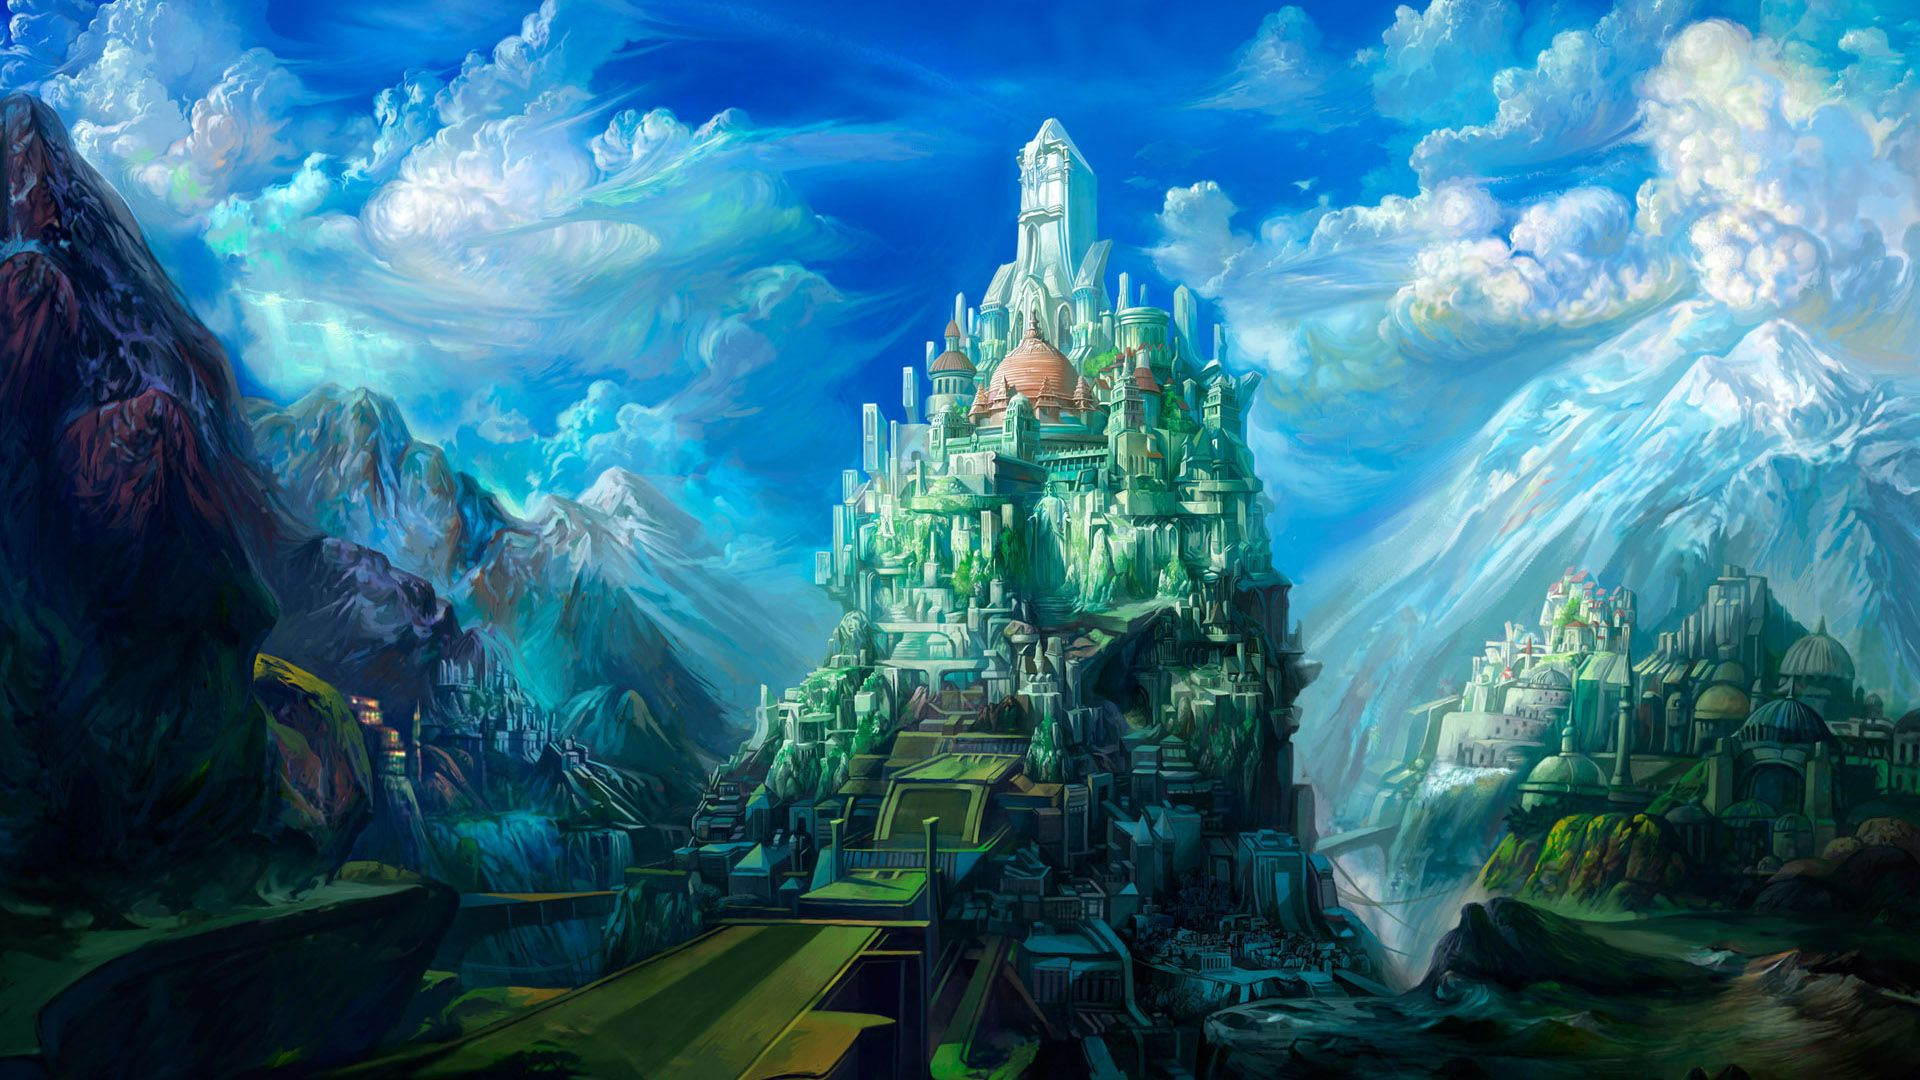 Wonderful 3D Art Castle Fantasy Picture Image Background HD Wallpaper Widescreen